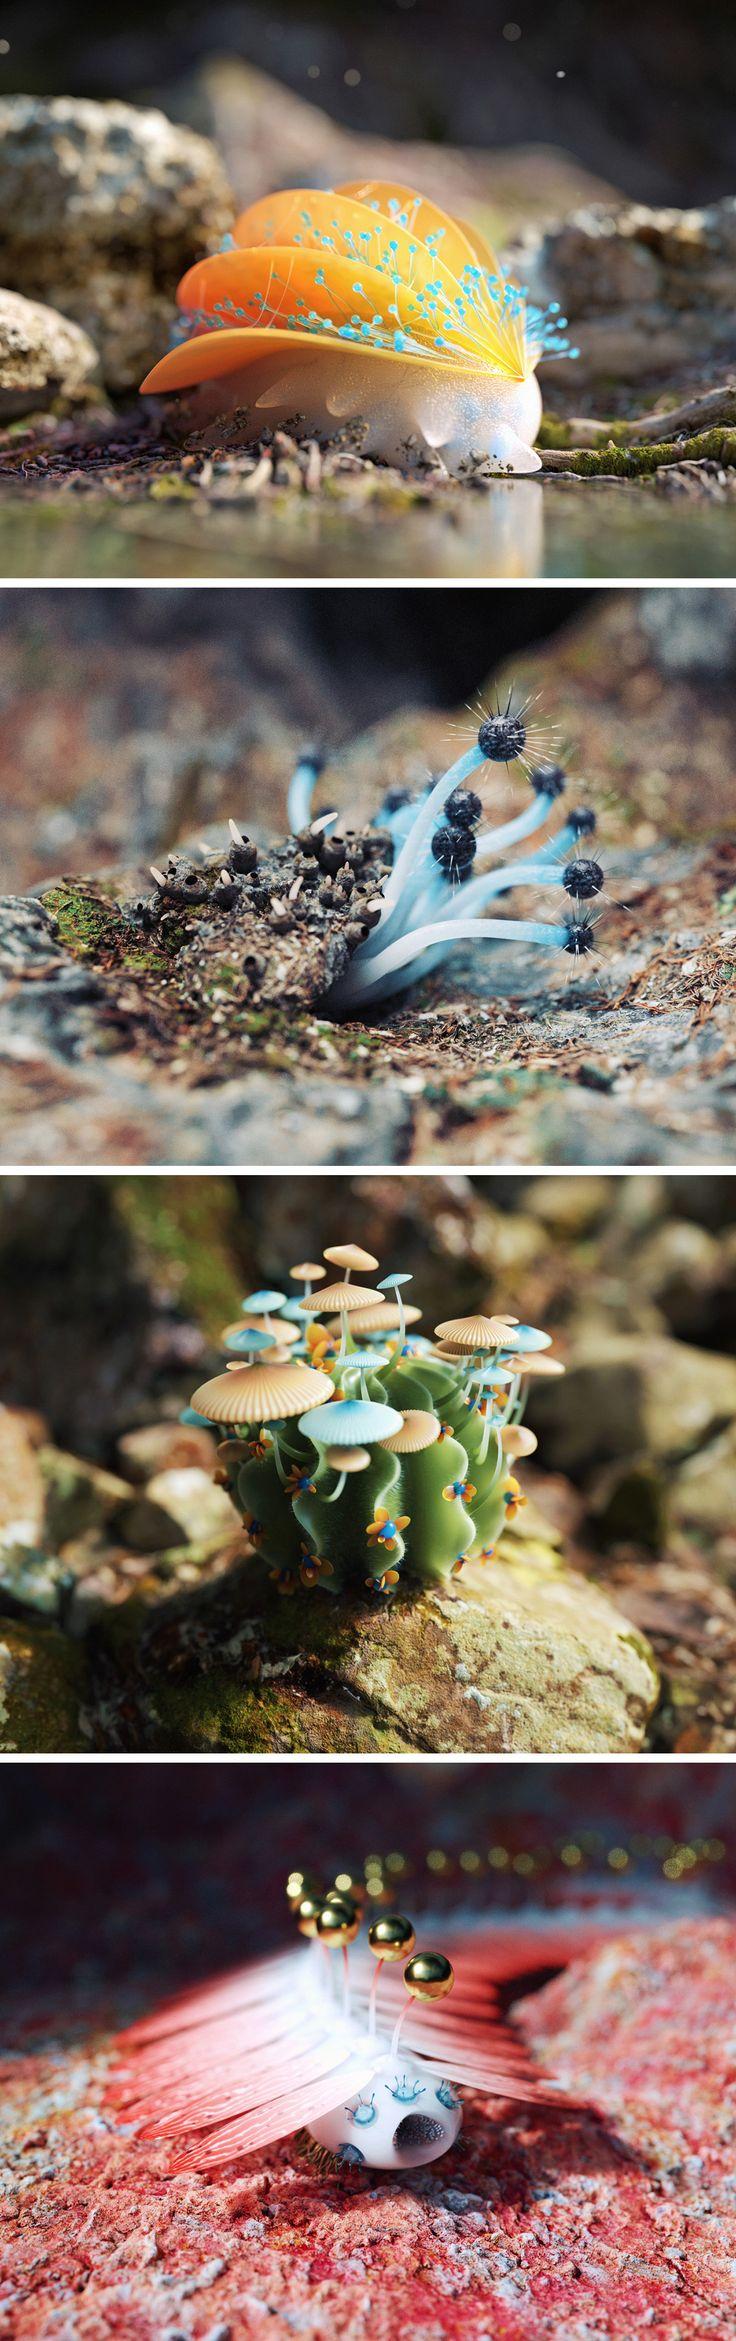 Digitally Rendered Alien Creatures by Zhang Chenxi